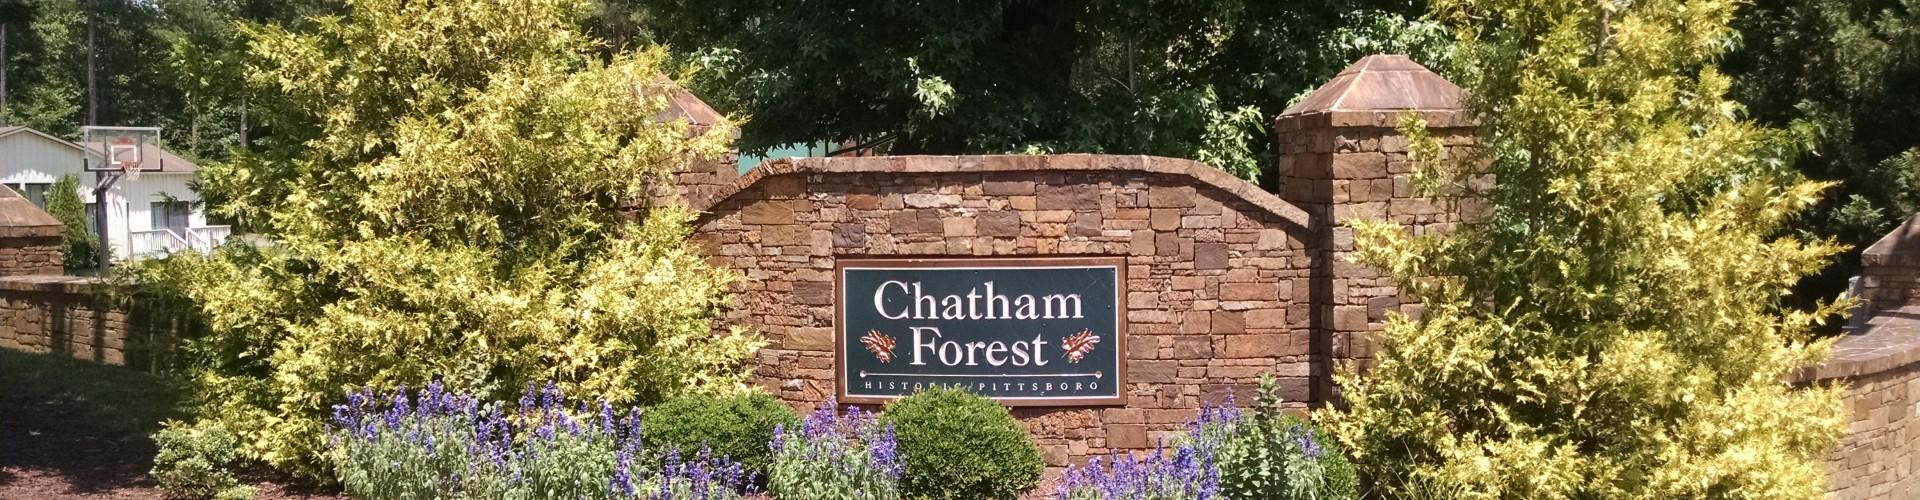 Pittsboro NC Chatham Forest